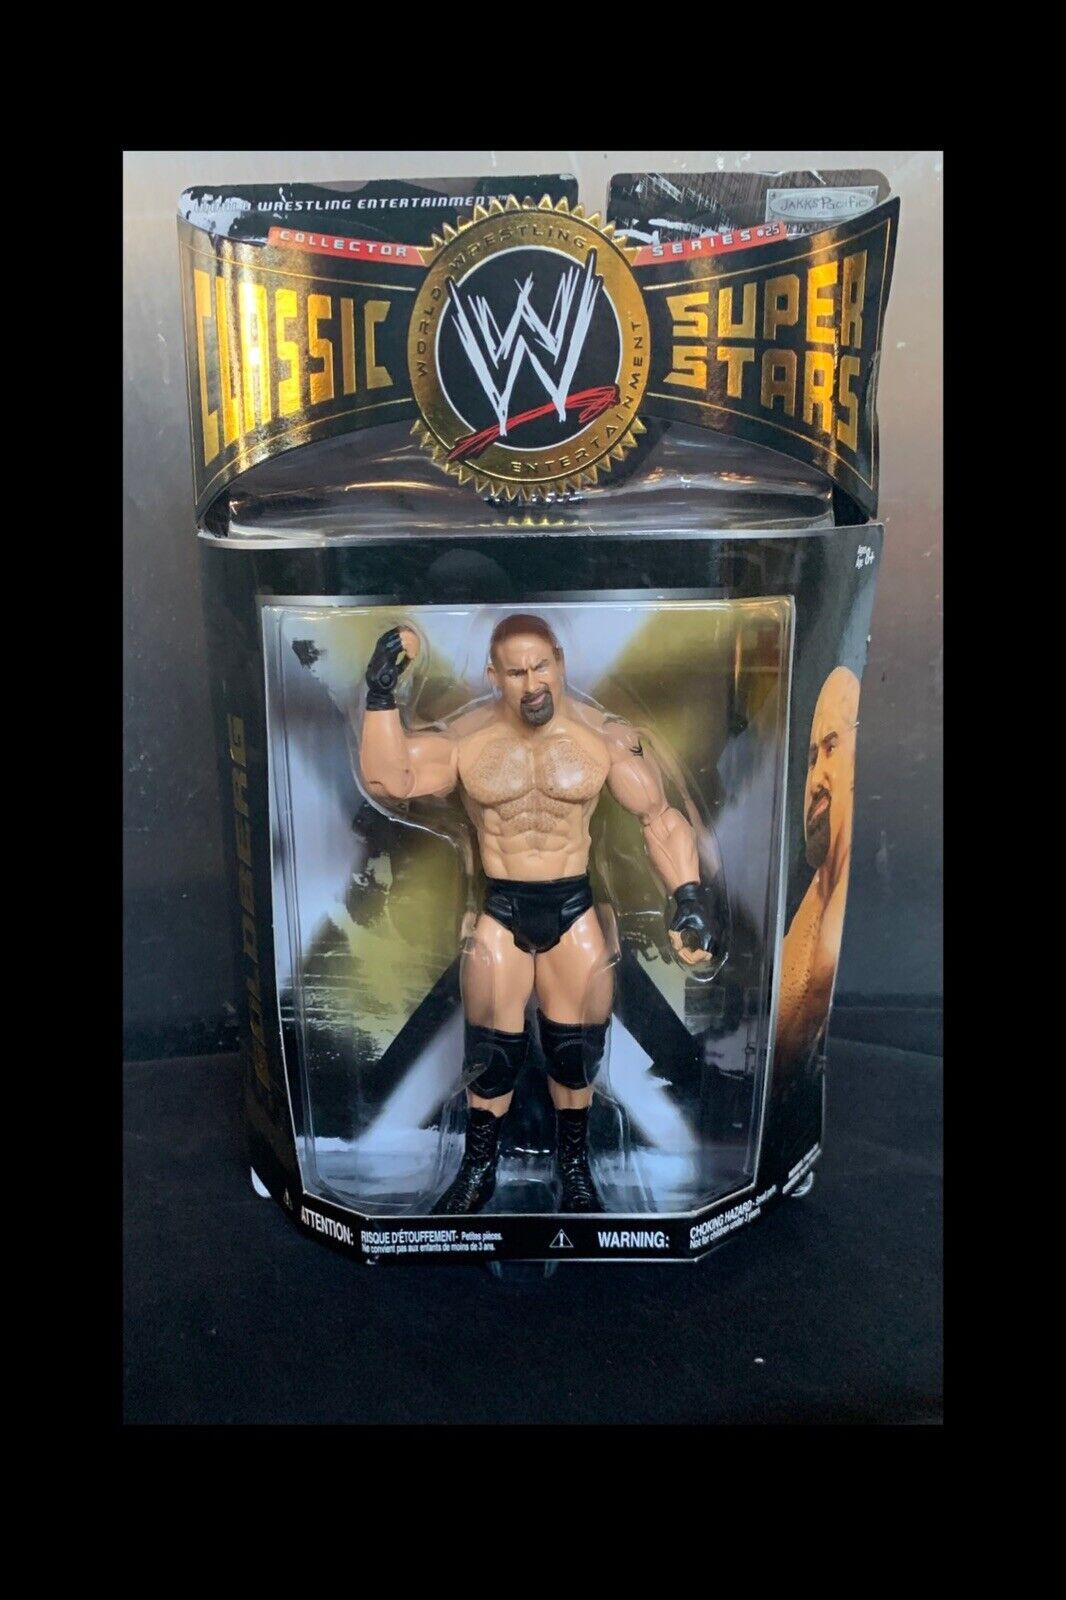 WWE Jakks Pacific WRESTLING classeIC SUPERestrellaS Series 25 oroberg cifra Nuovo in Scatola